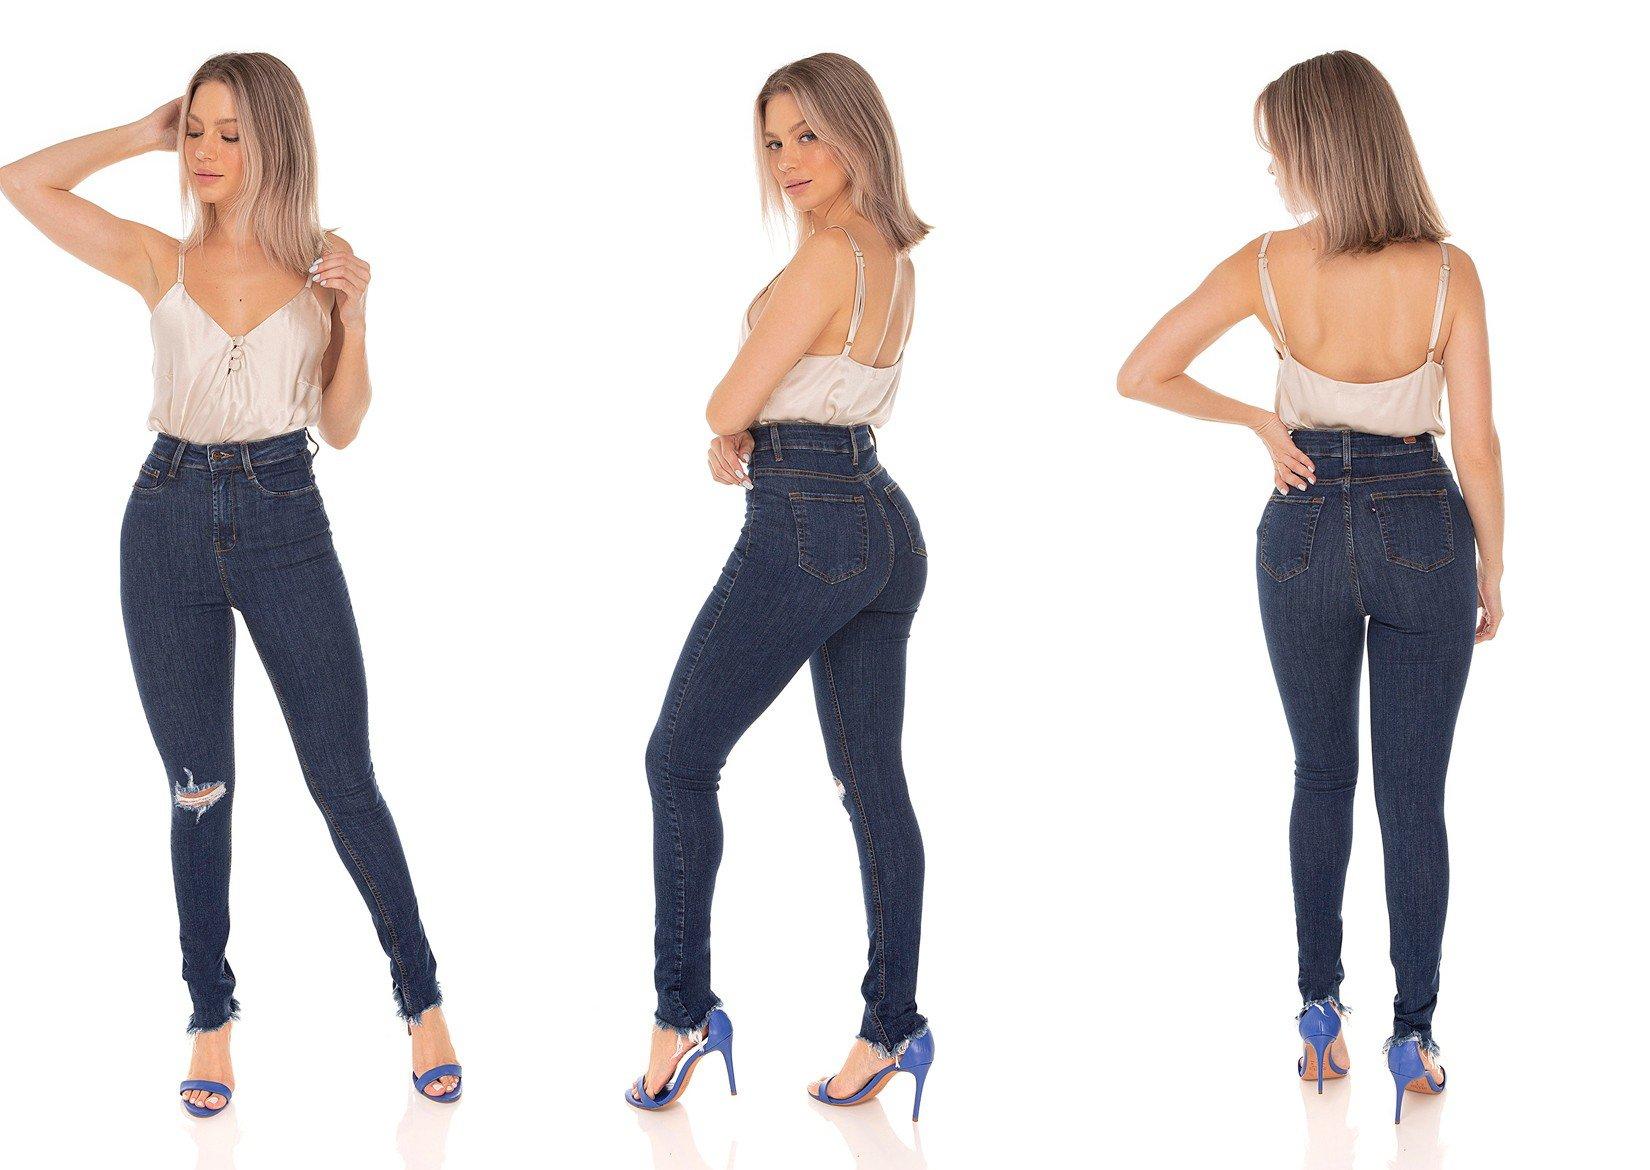 dz3585 calca jeans feminina skinny hot pants rasgo joelho denim zero tripla